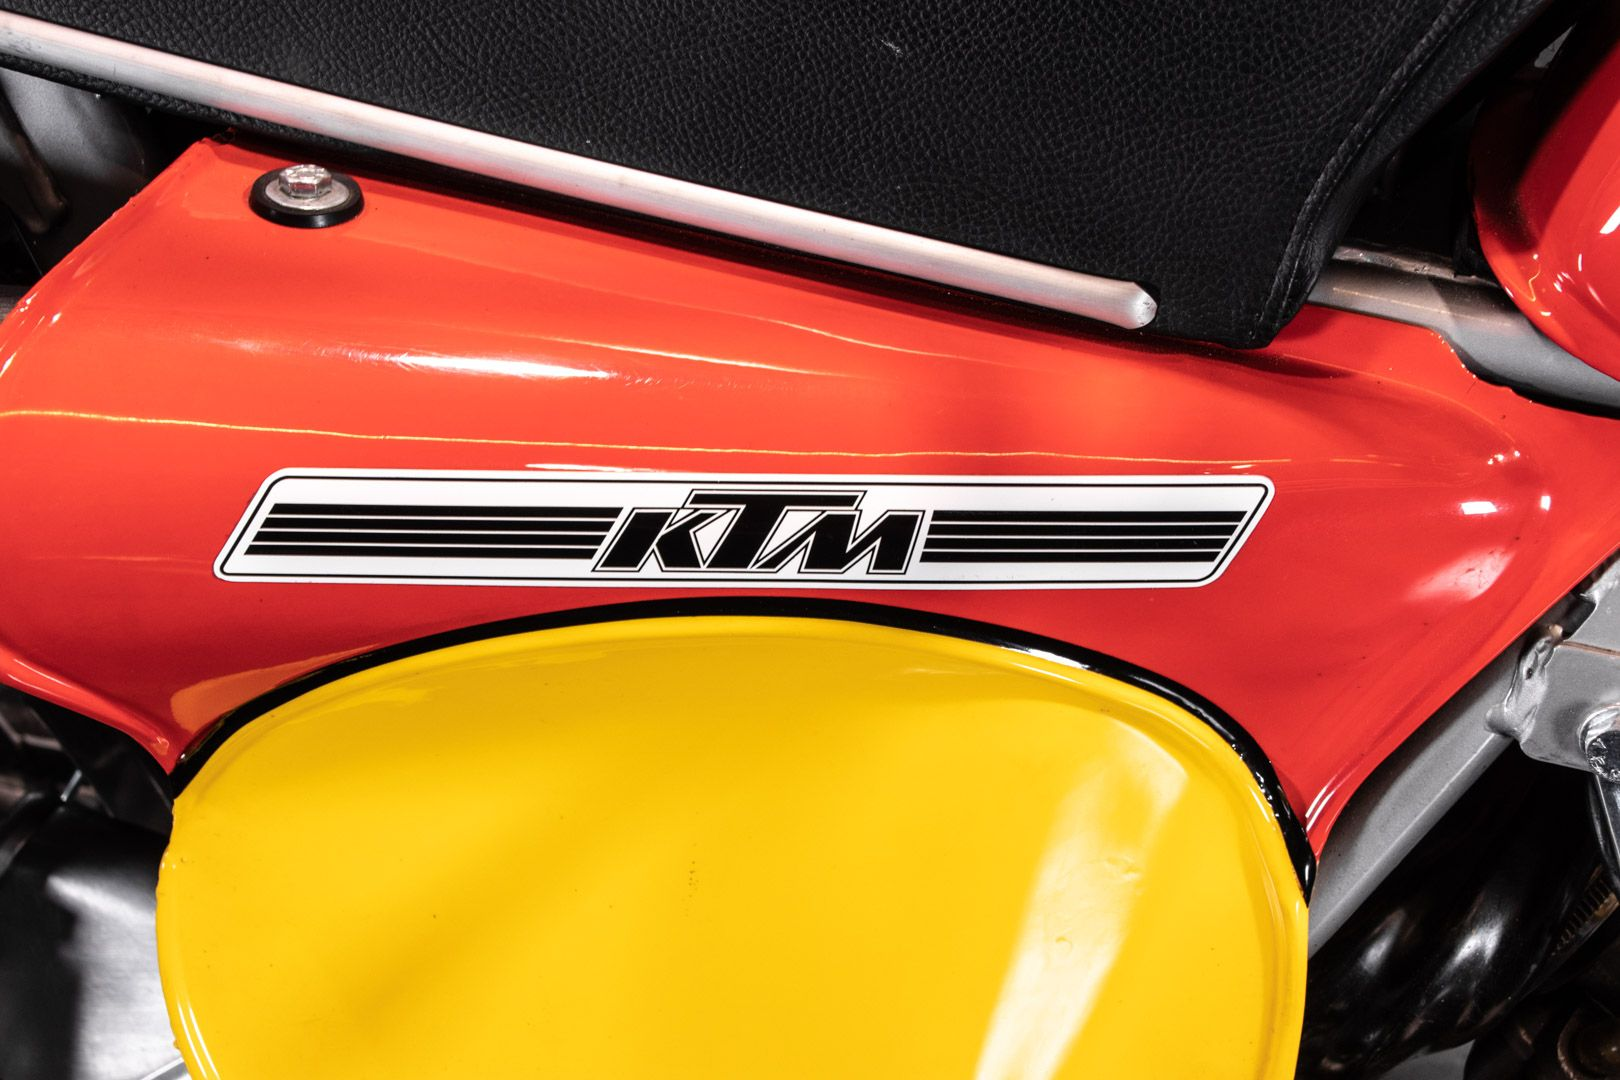 1976 KTM GS 250 84015